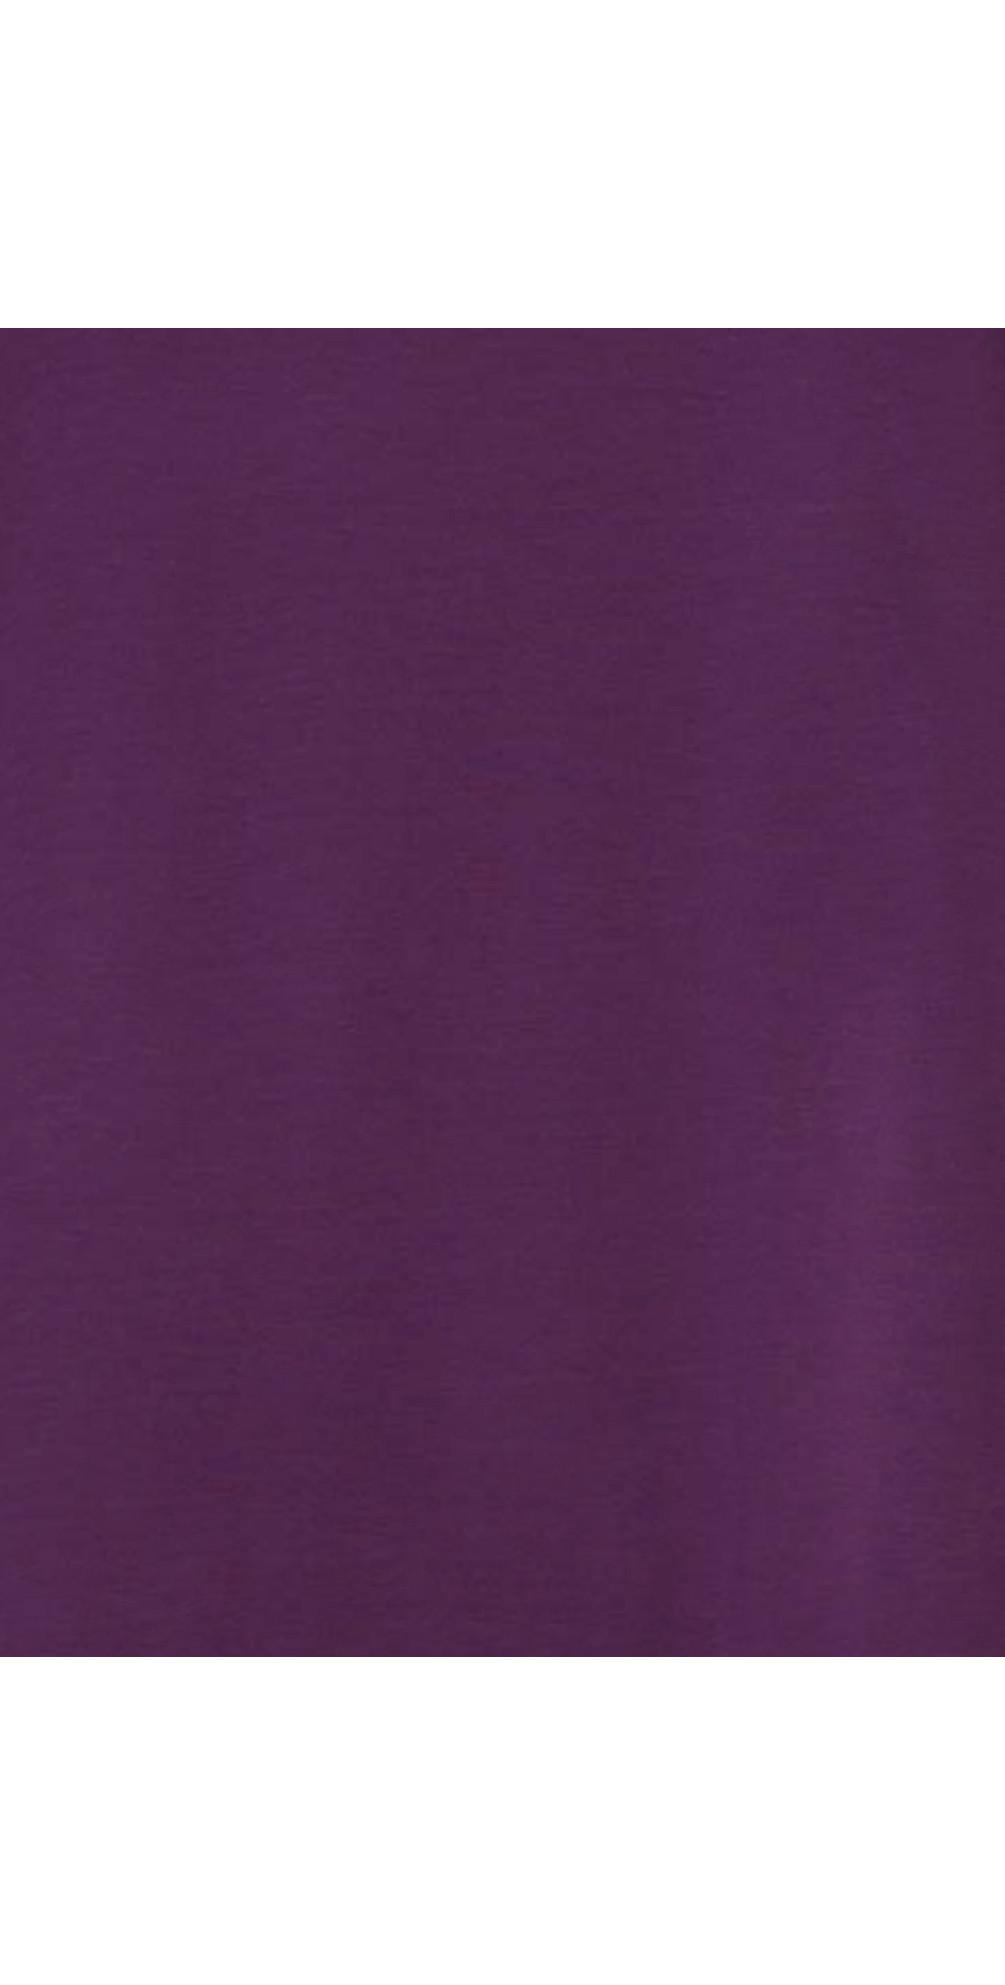 d286122cb1a Masai Clothing Busma Tunic Top in 751-Dahlia